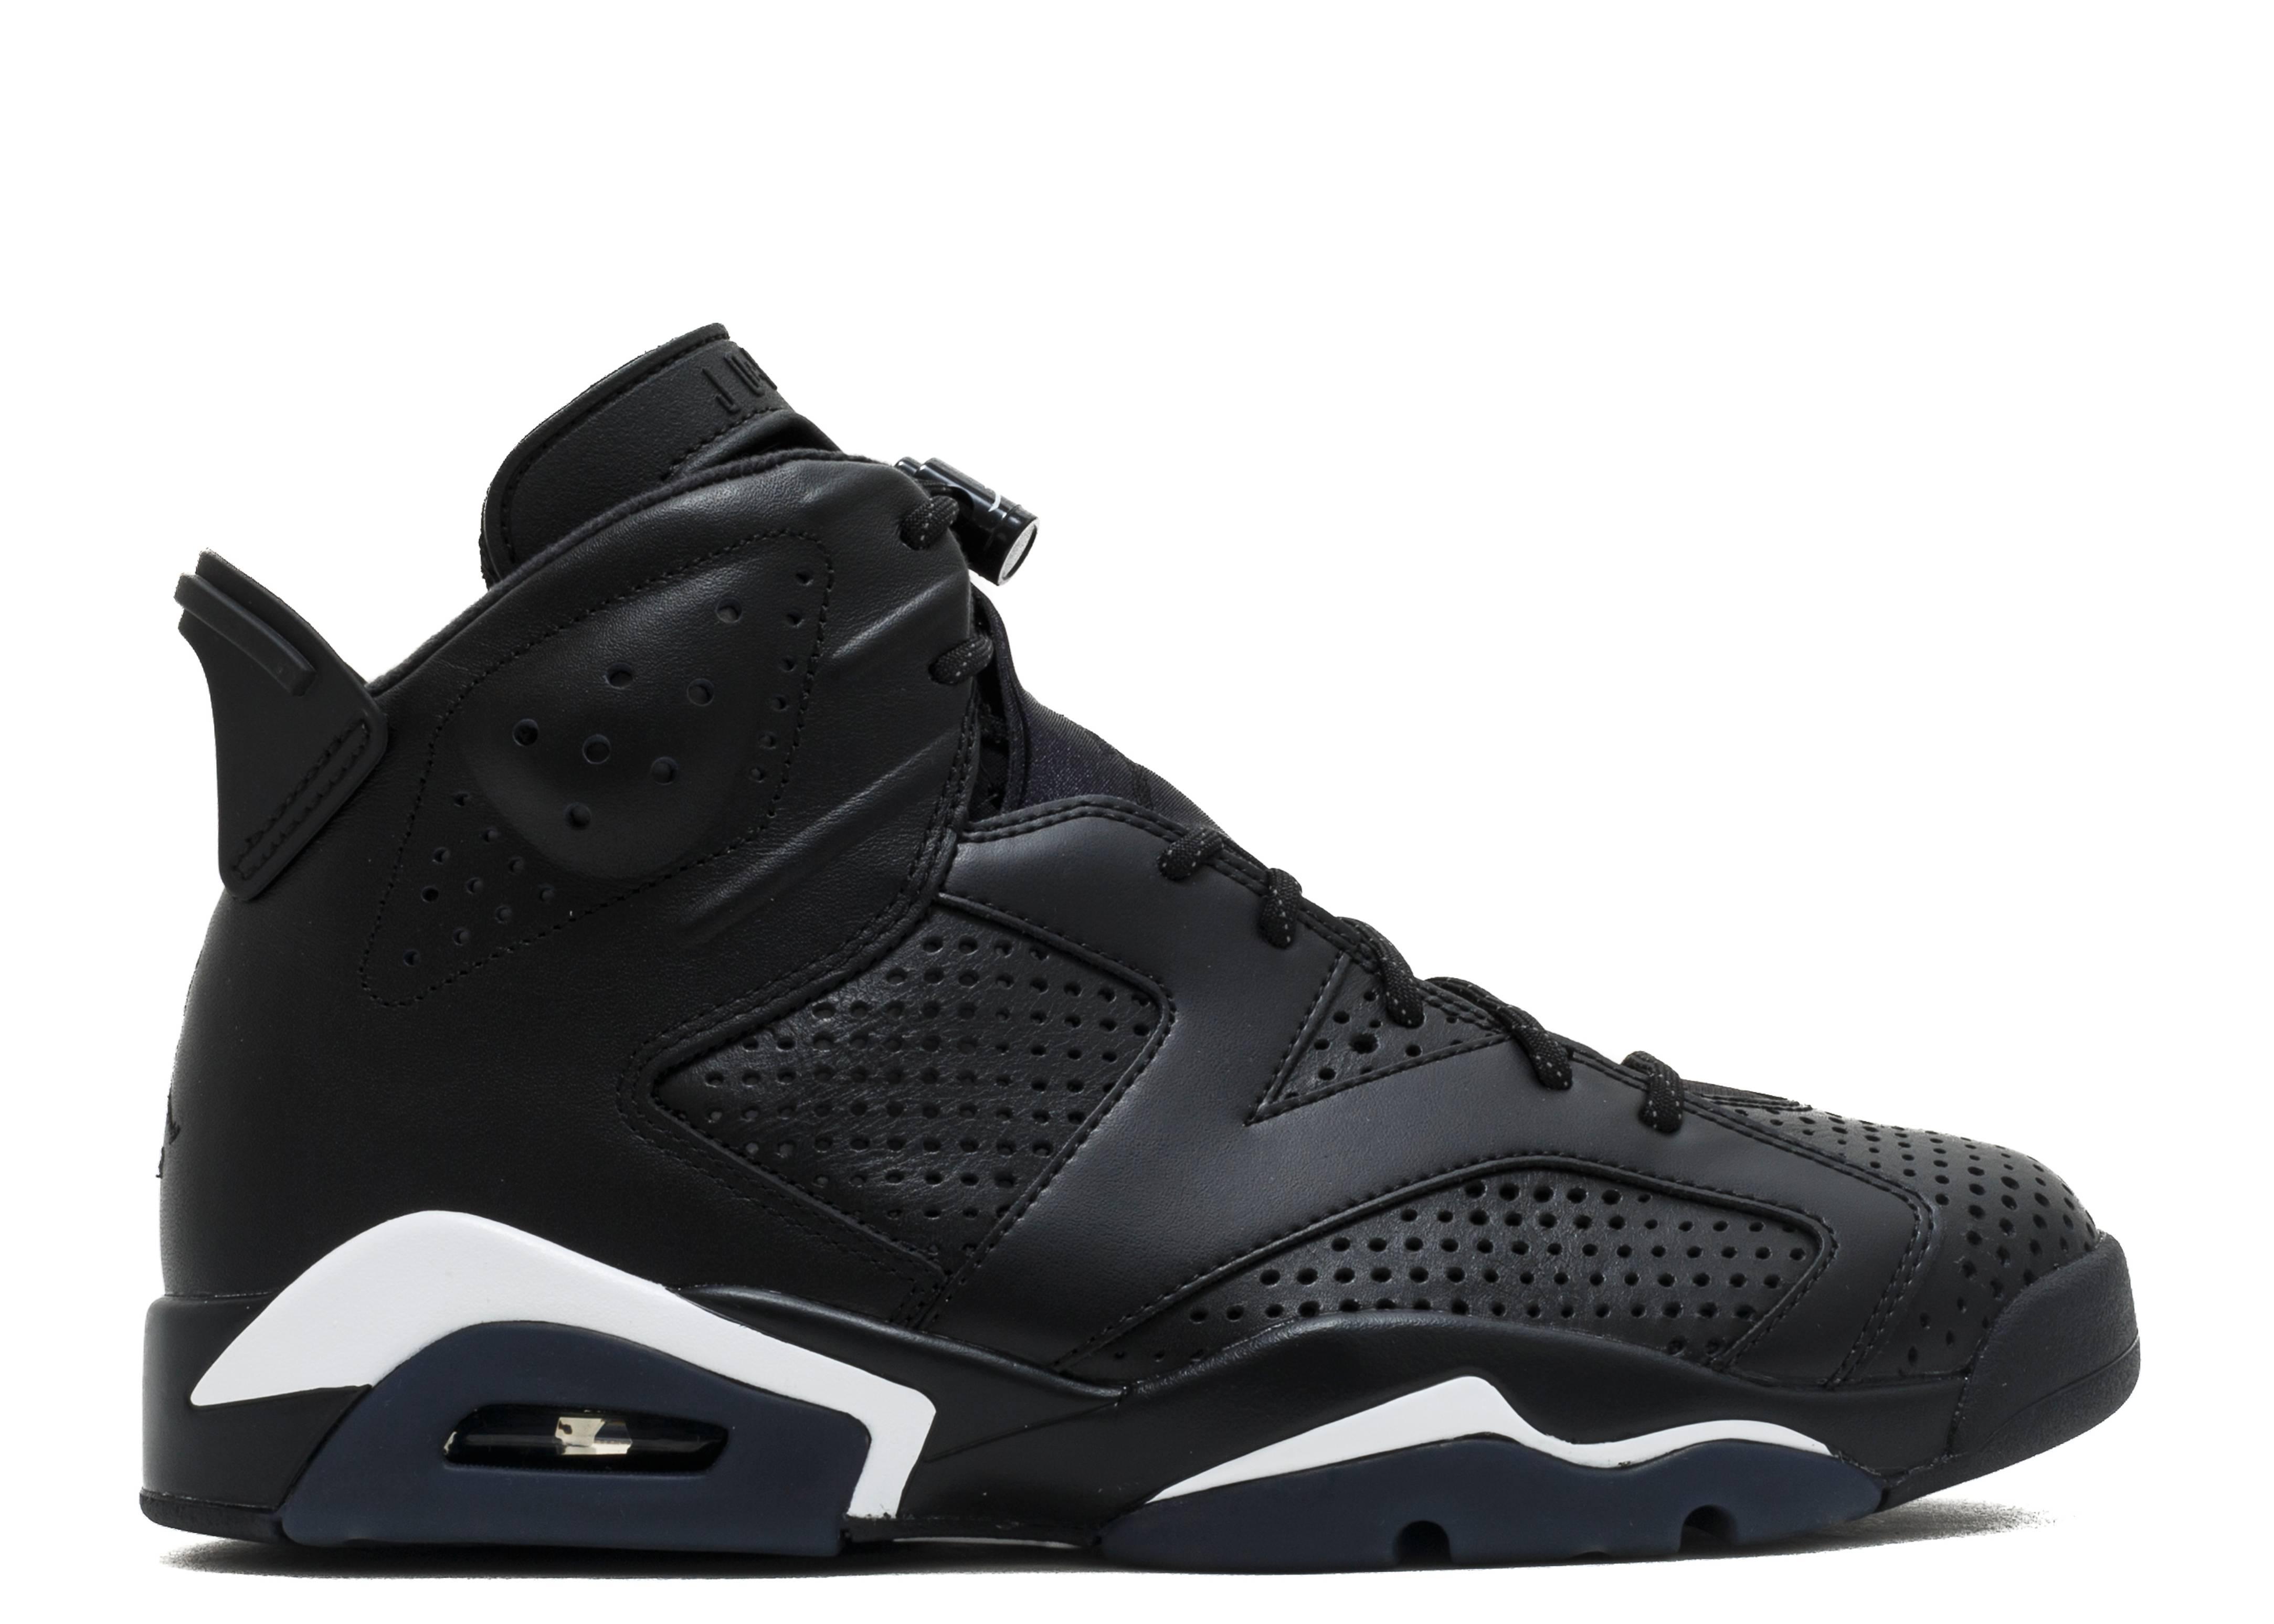 d5172f1bdf4 Air Jordan 6 Retro